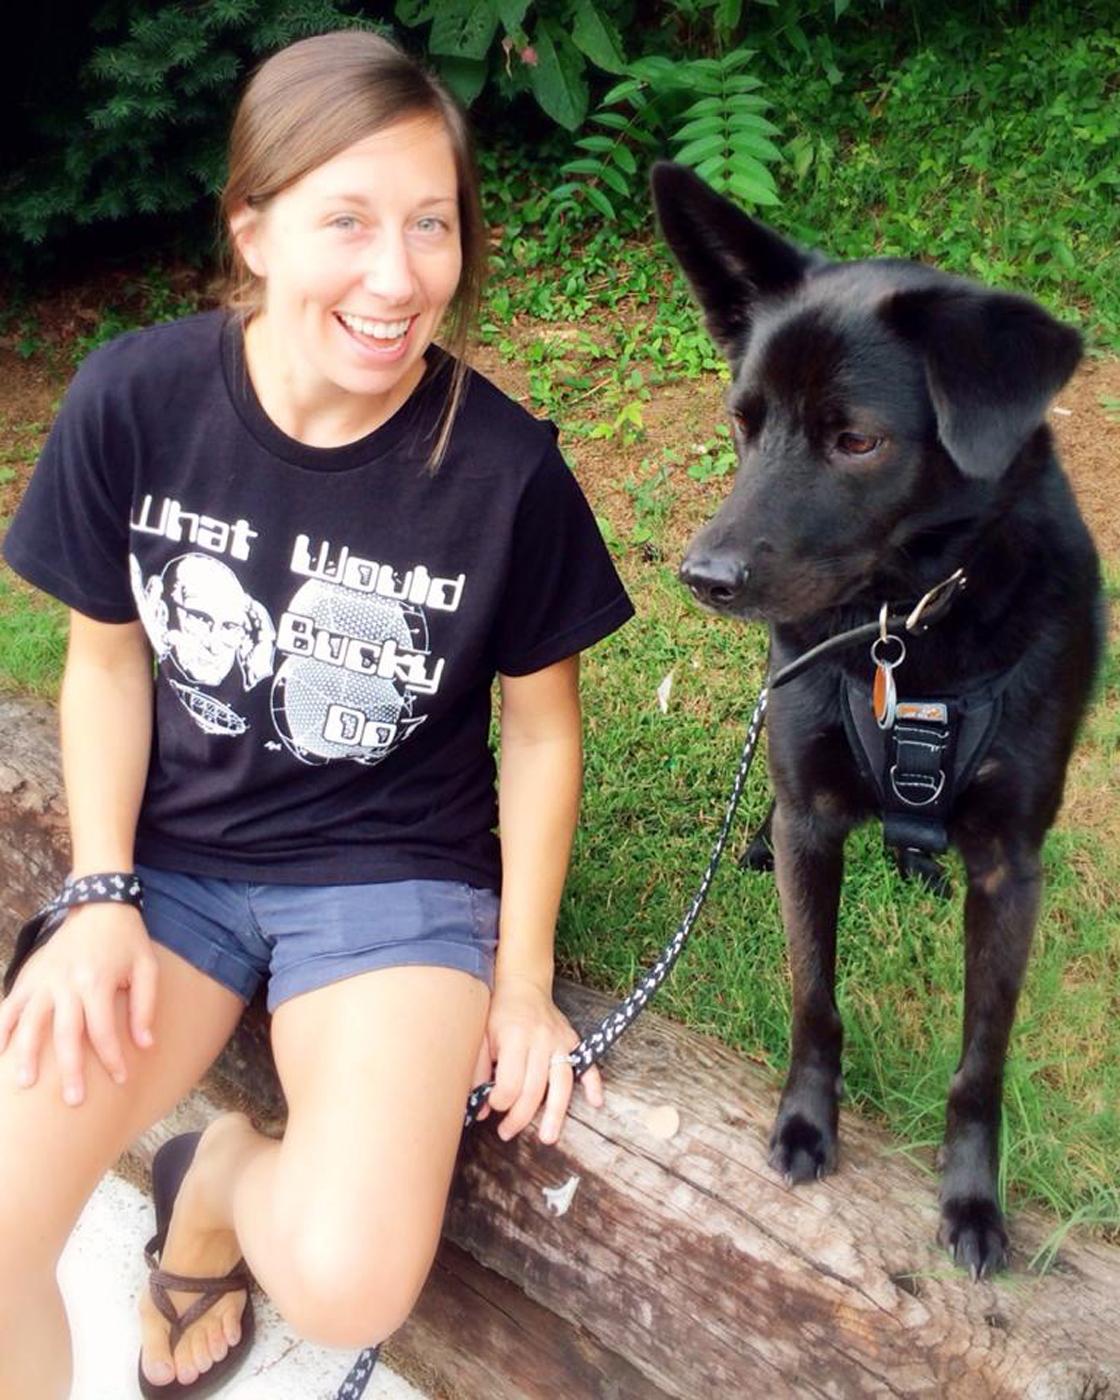 Danielle sporting her Buckminster Fuller t-shirt with our dog Buckminster Fuller Ramos.  A.K.A. Minster.